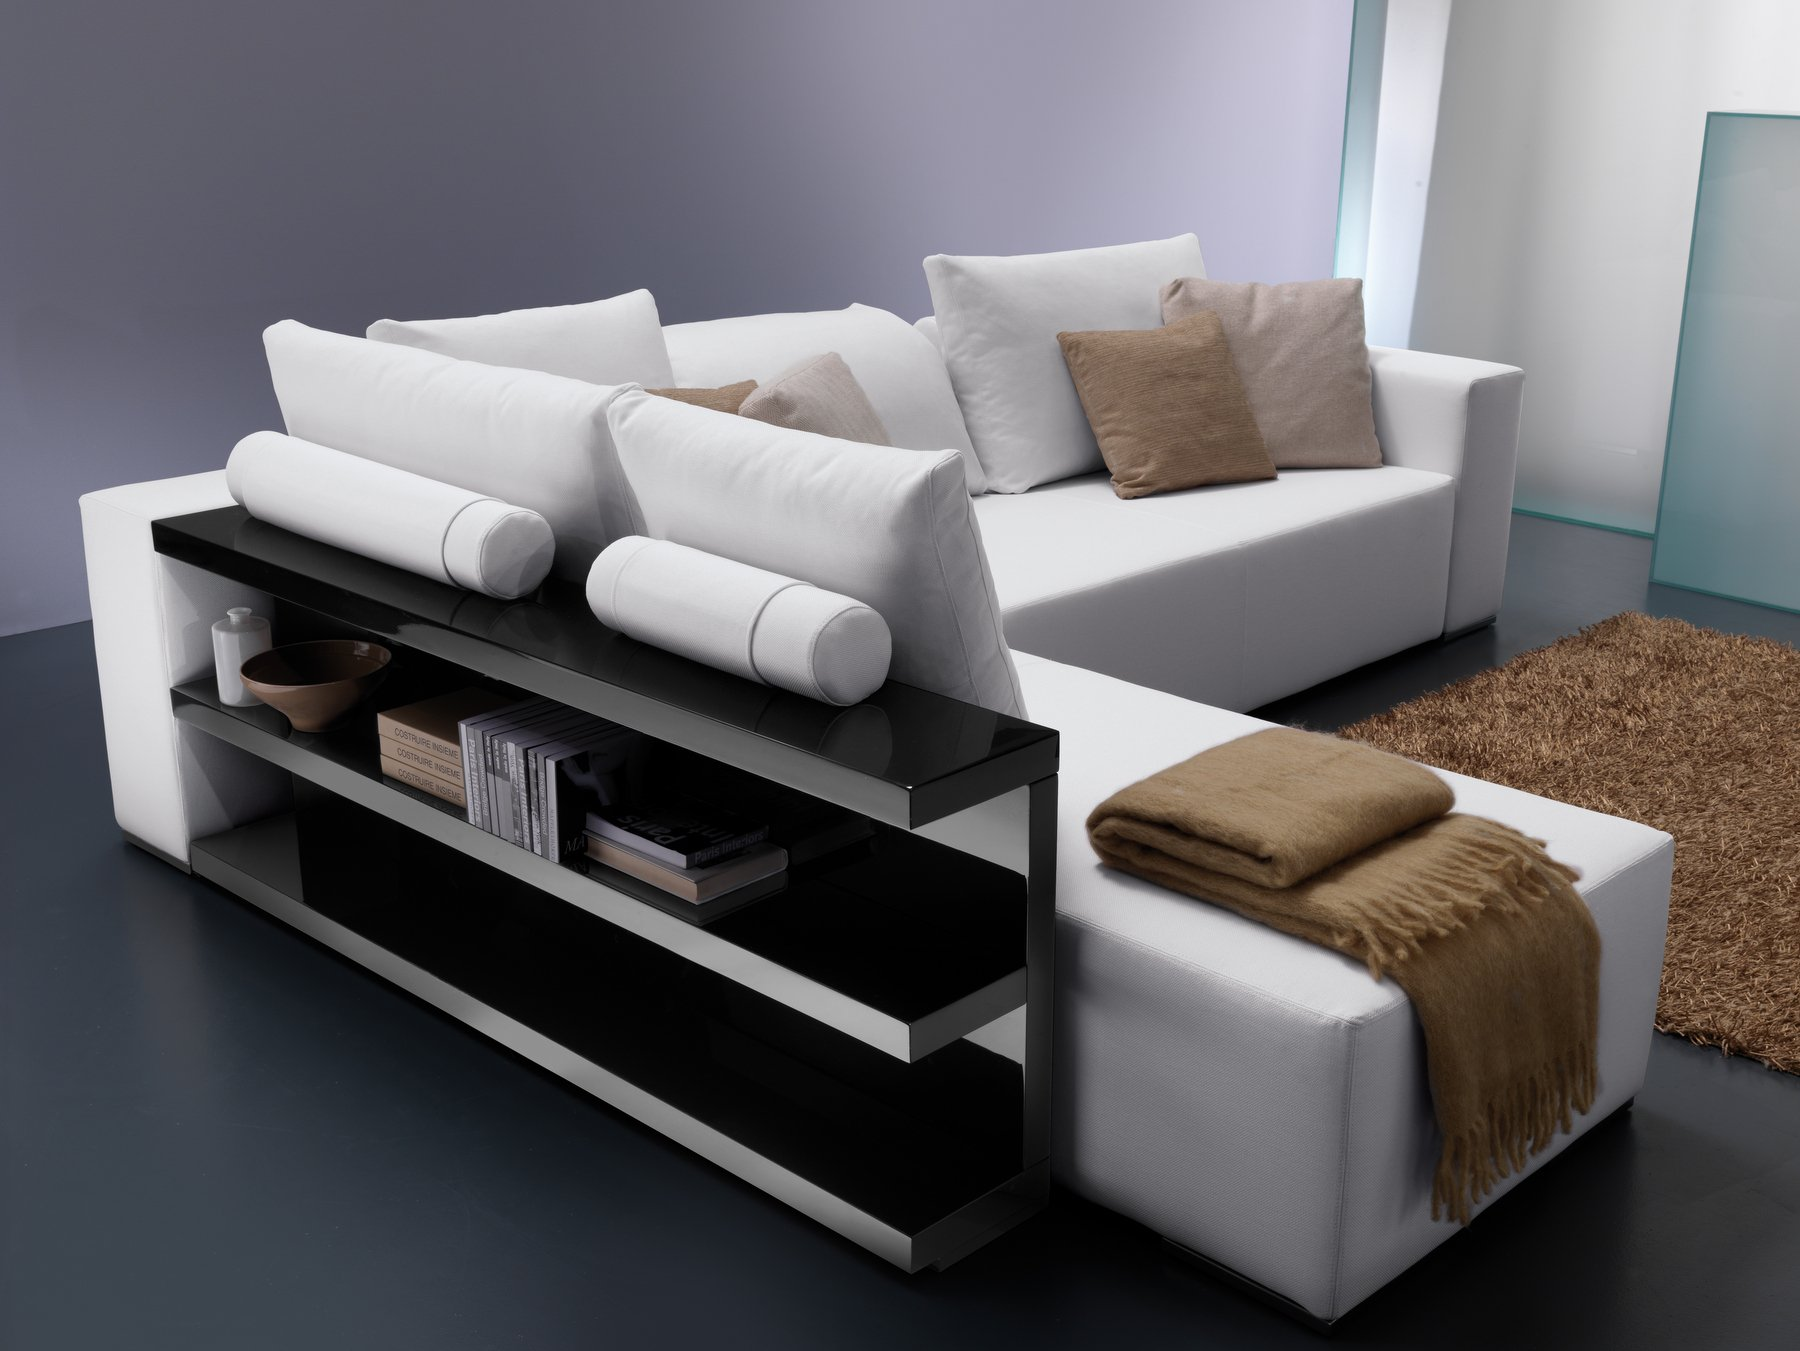 popper canap avec porte revues int gr by bontempi casa design lino codato. Black Bedroom Furniture Sets. Home Design Ideas